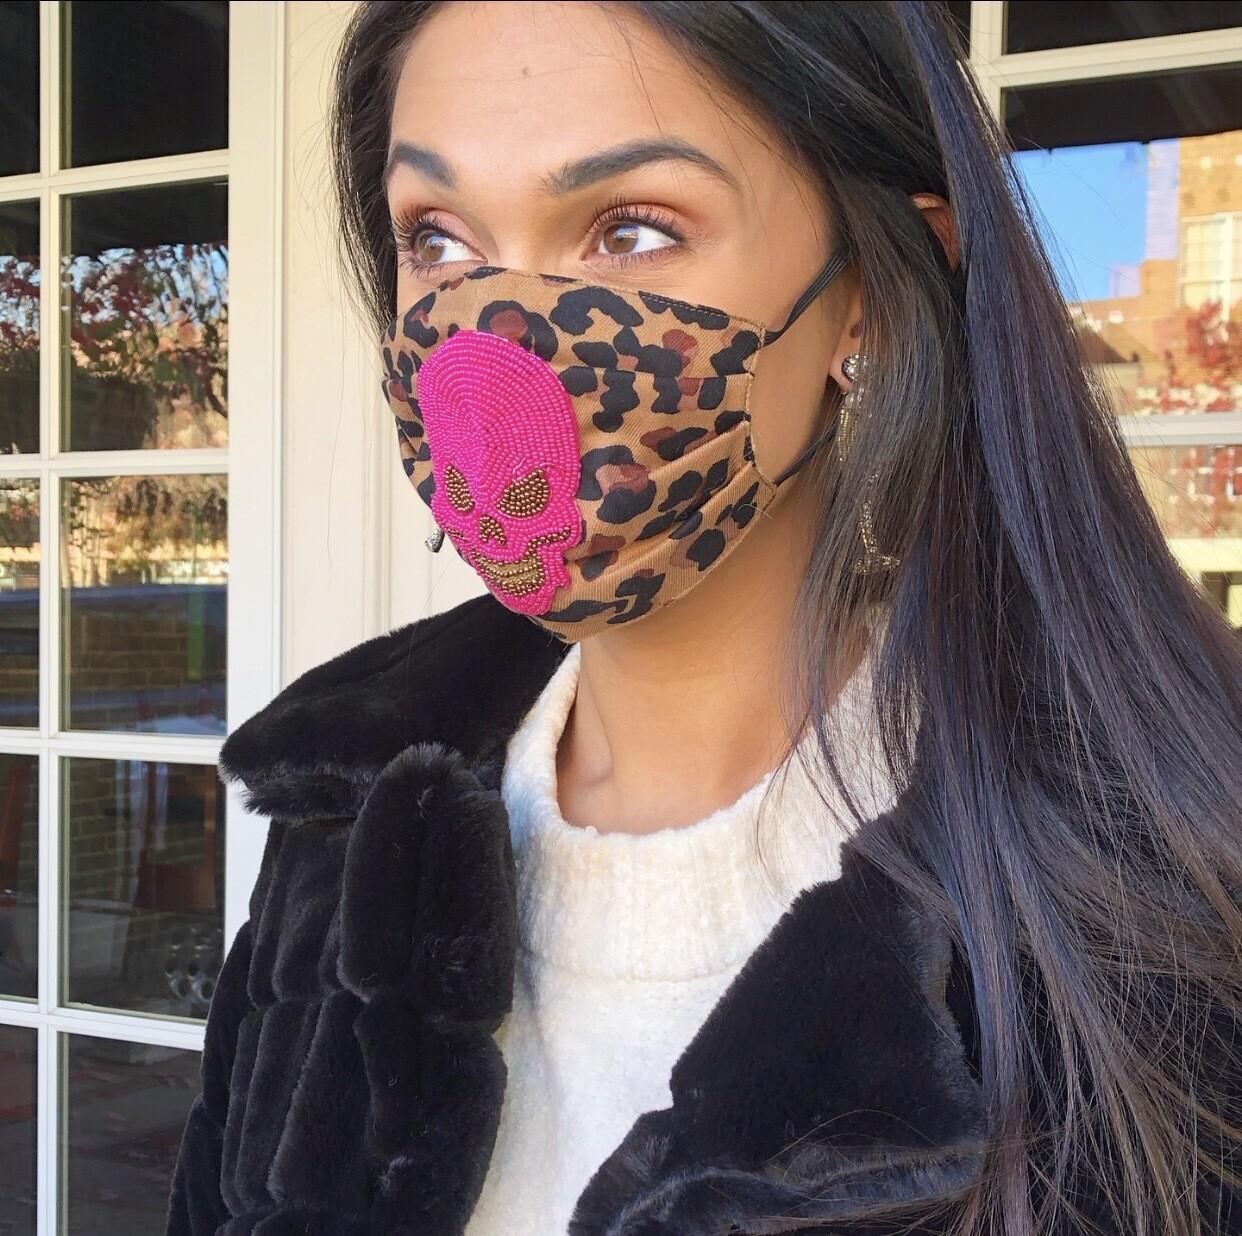 Leopard Mask With Fuchsia Skull